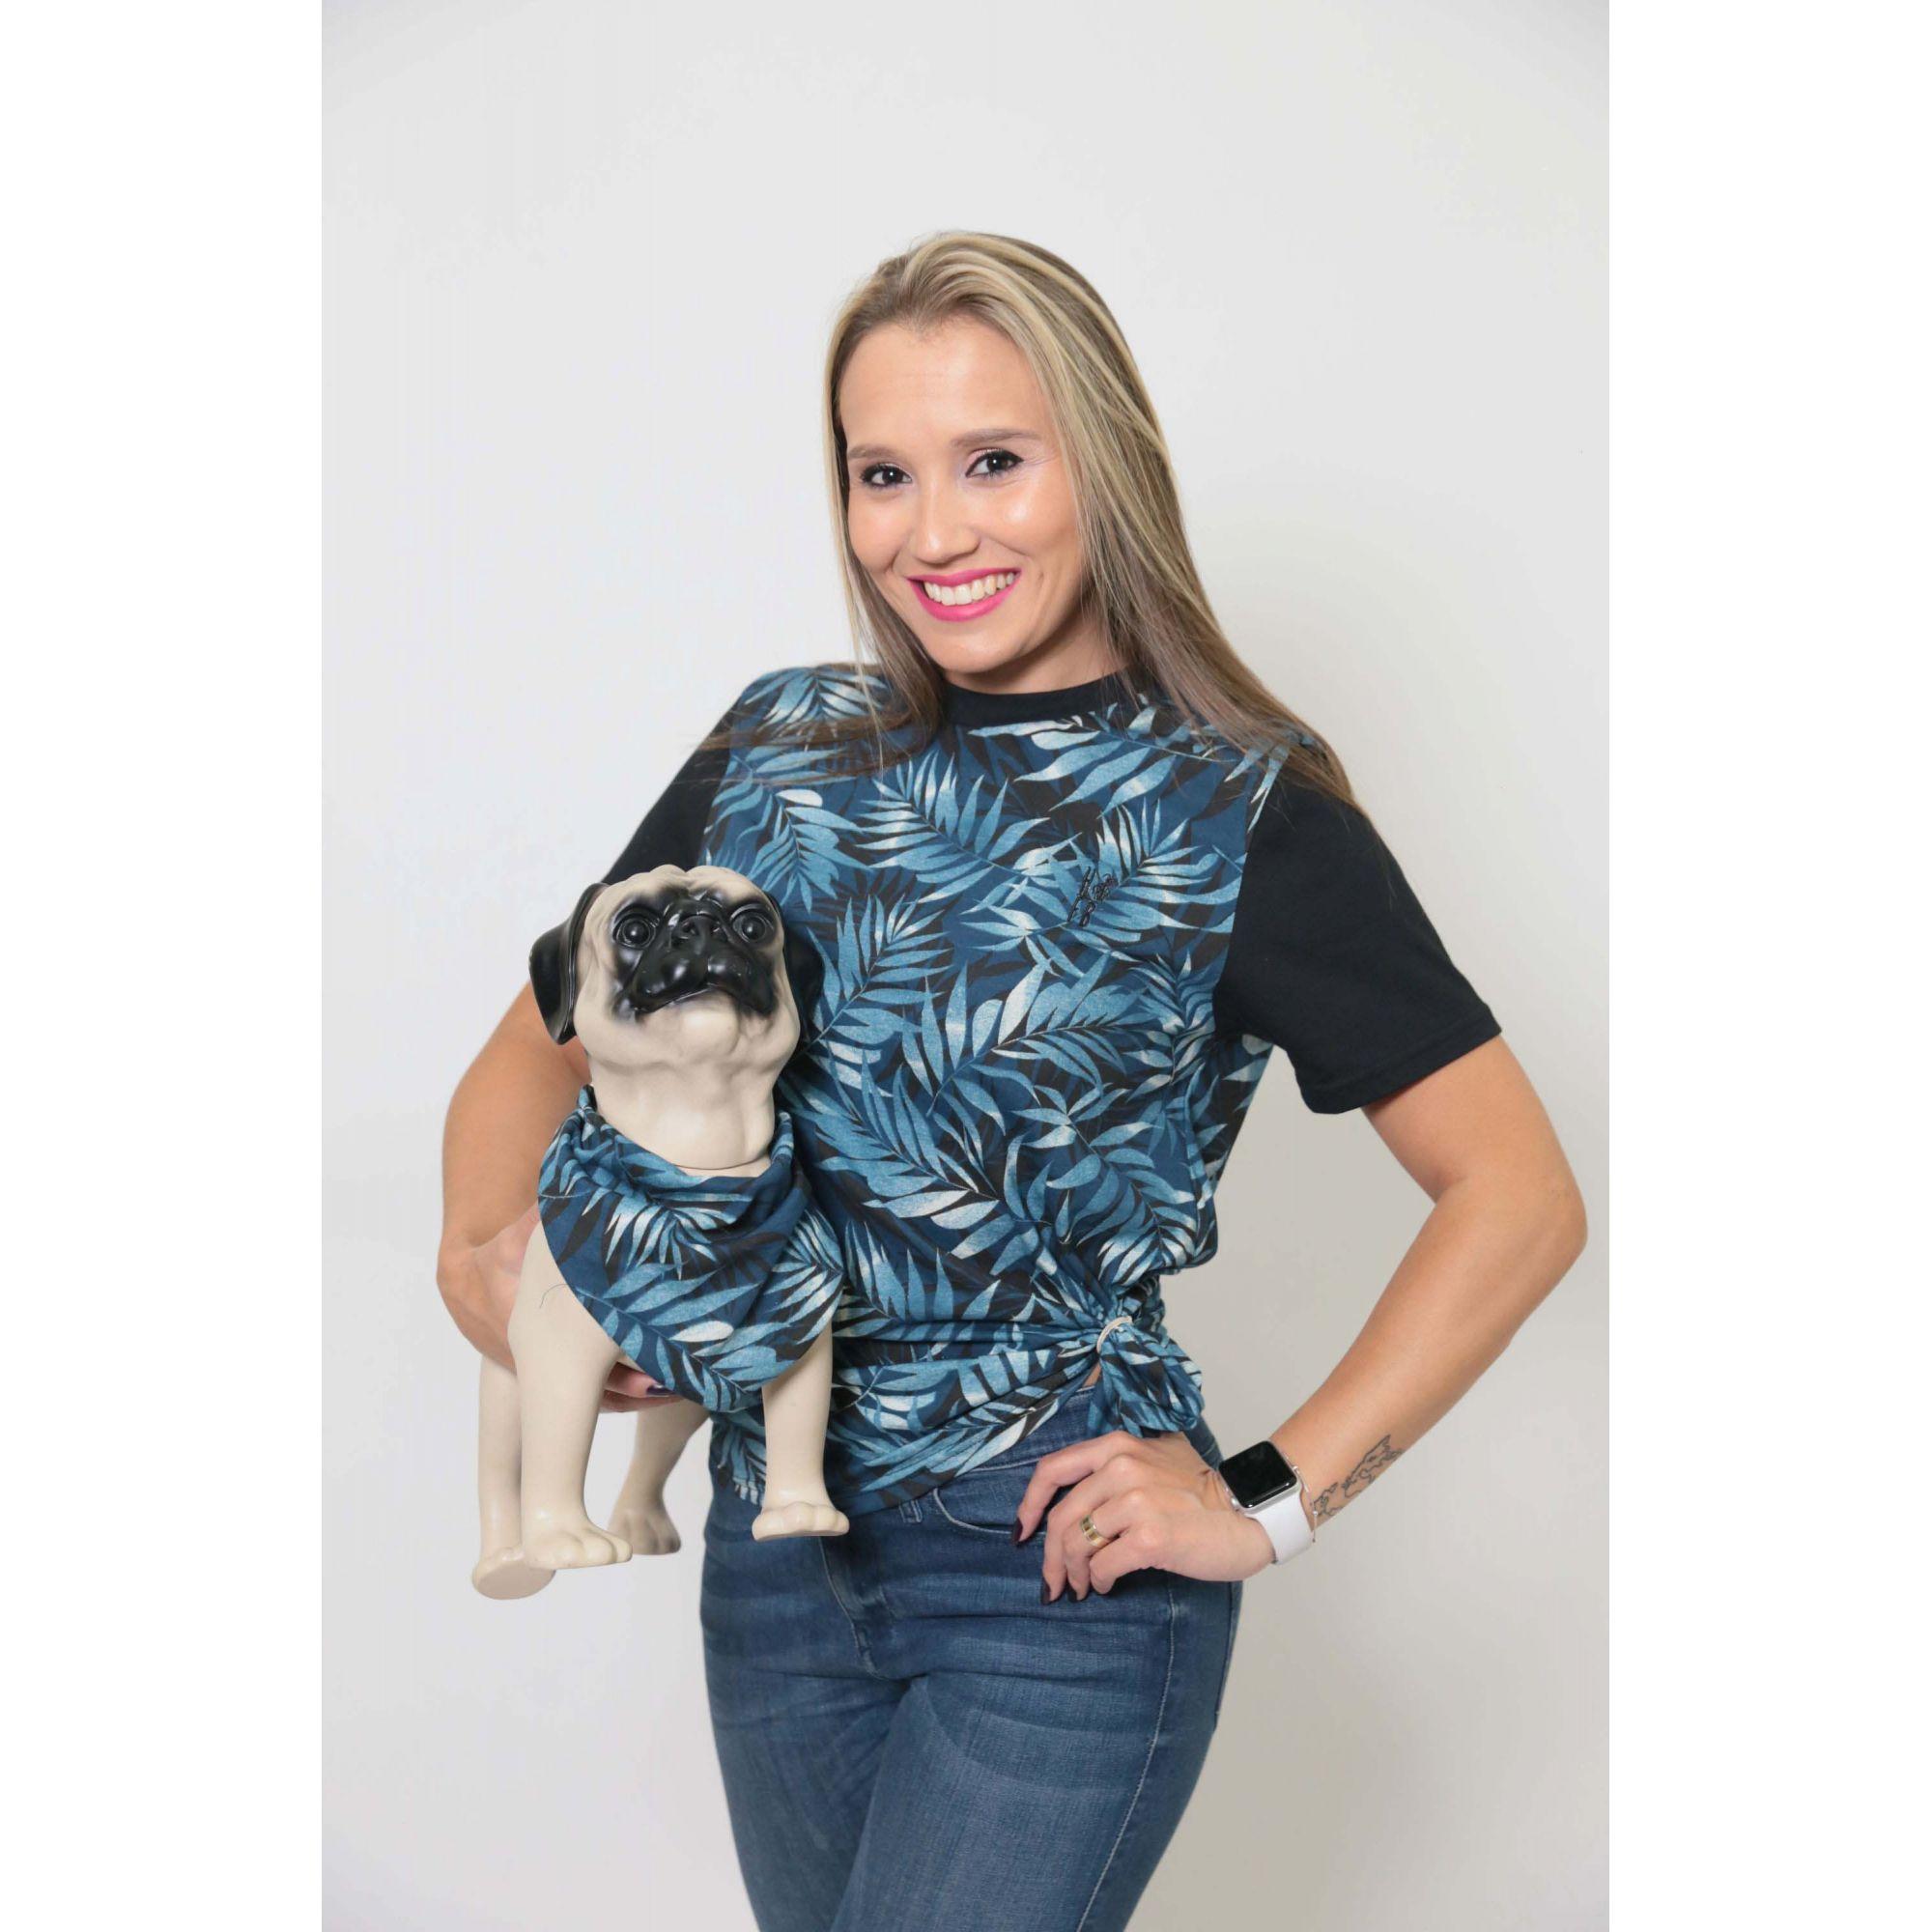 MÃE e PET > kit 02 Peças - T-shirt + Bandana Tropical Unissex [Coleção Tal Mãe Tal Pet]  - Heitor Fashion Brazil